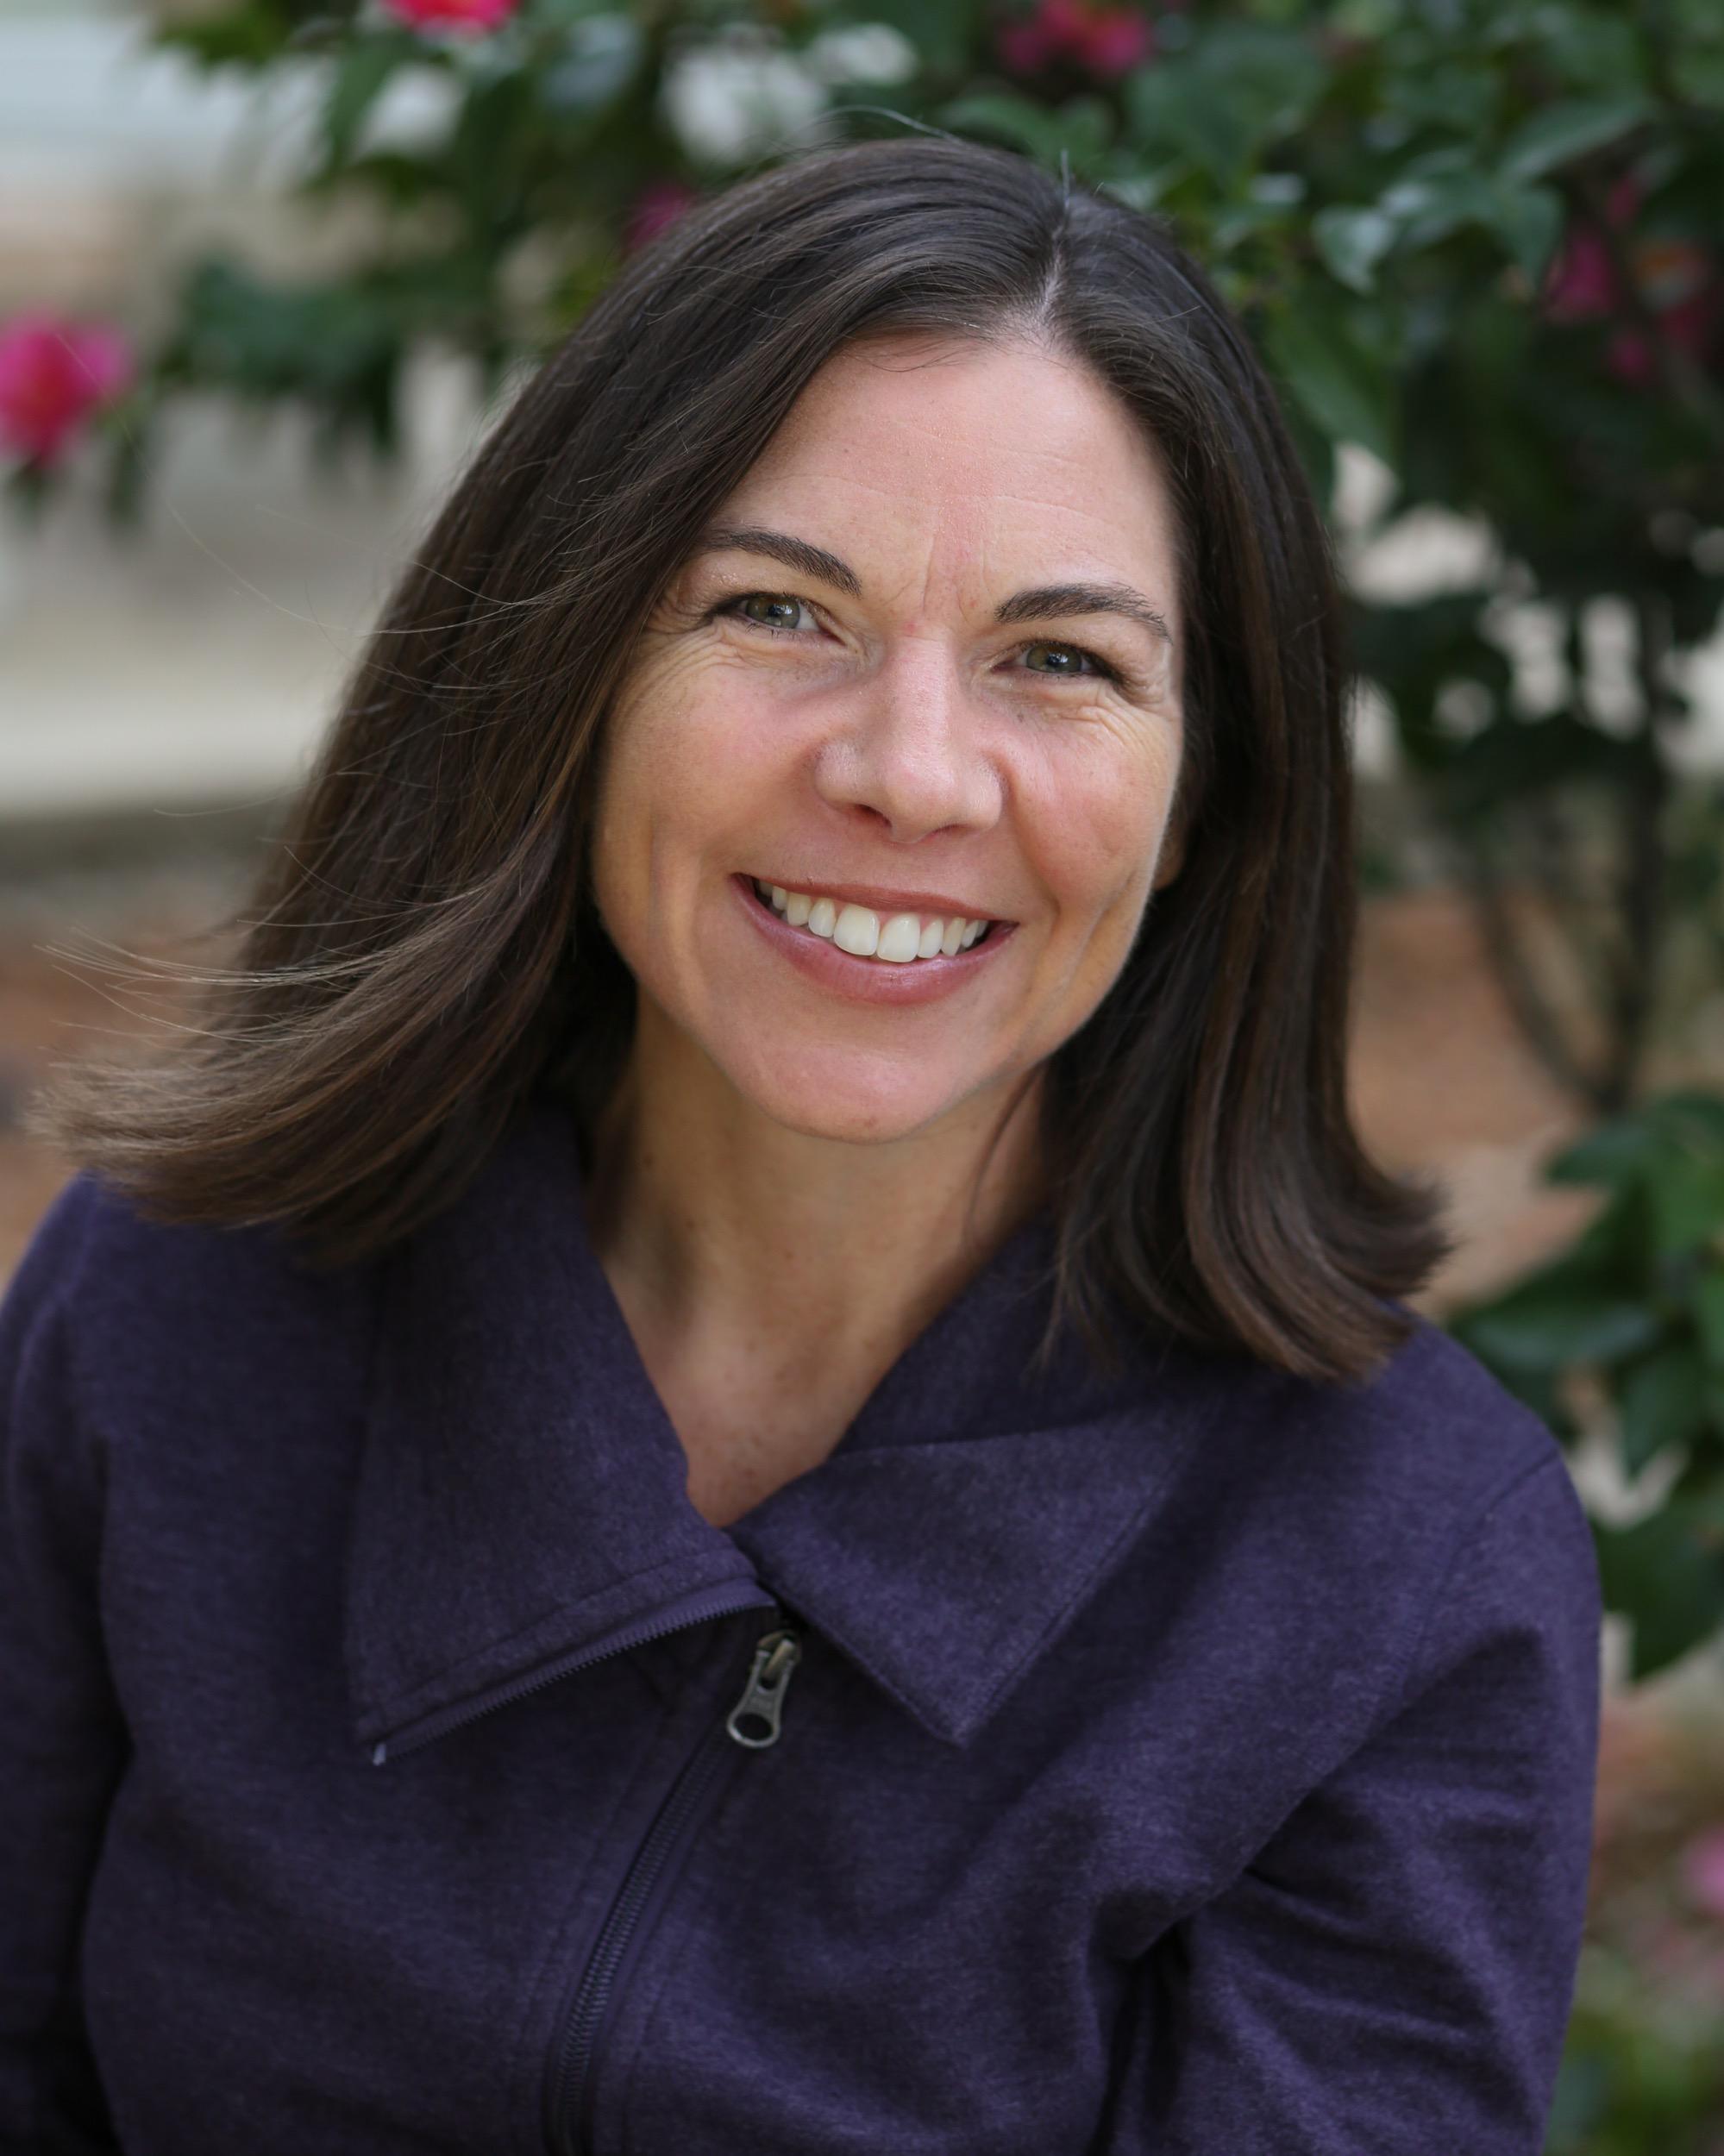 Chantal Valentine Admissions Director